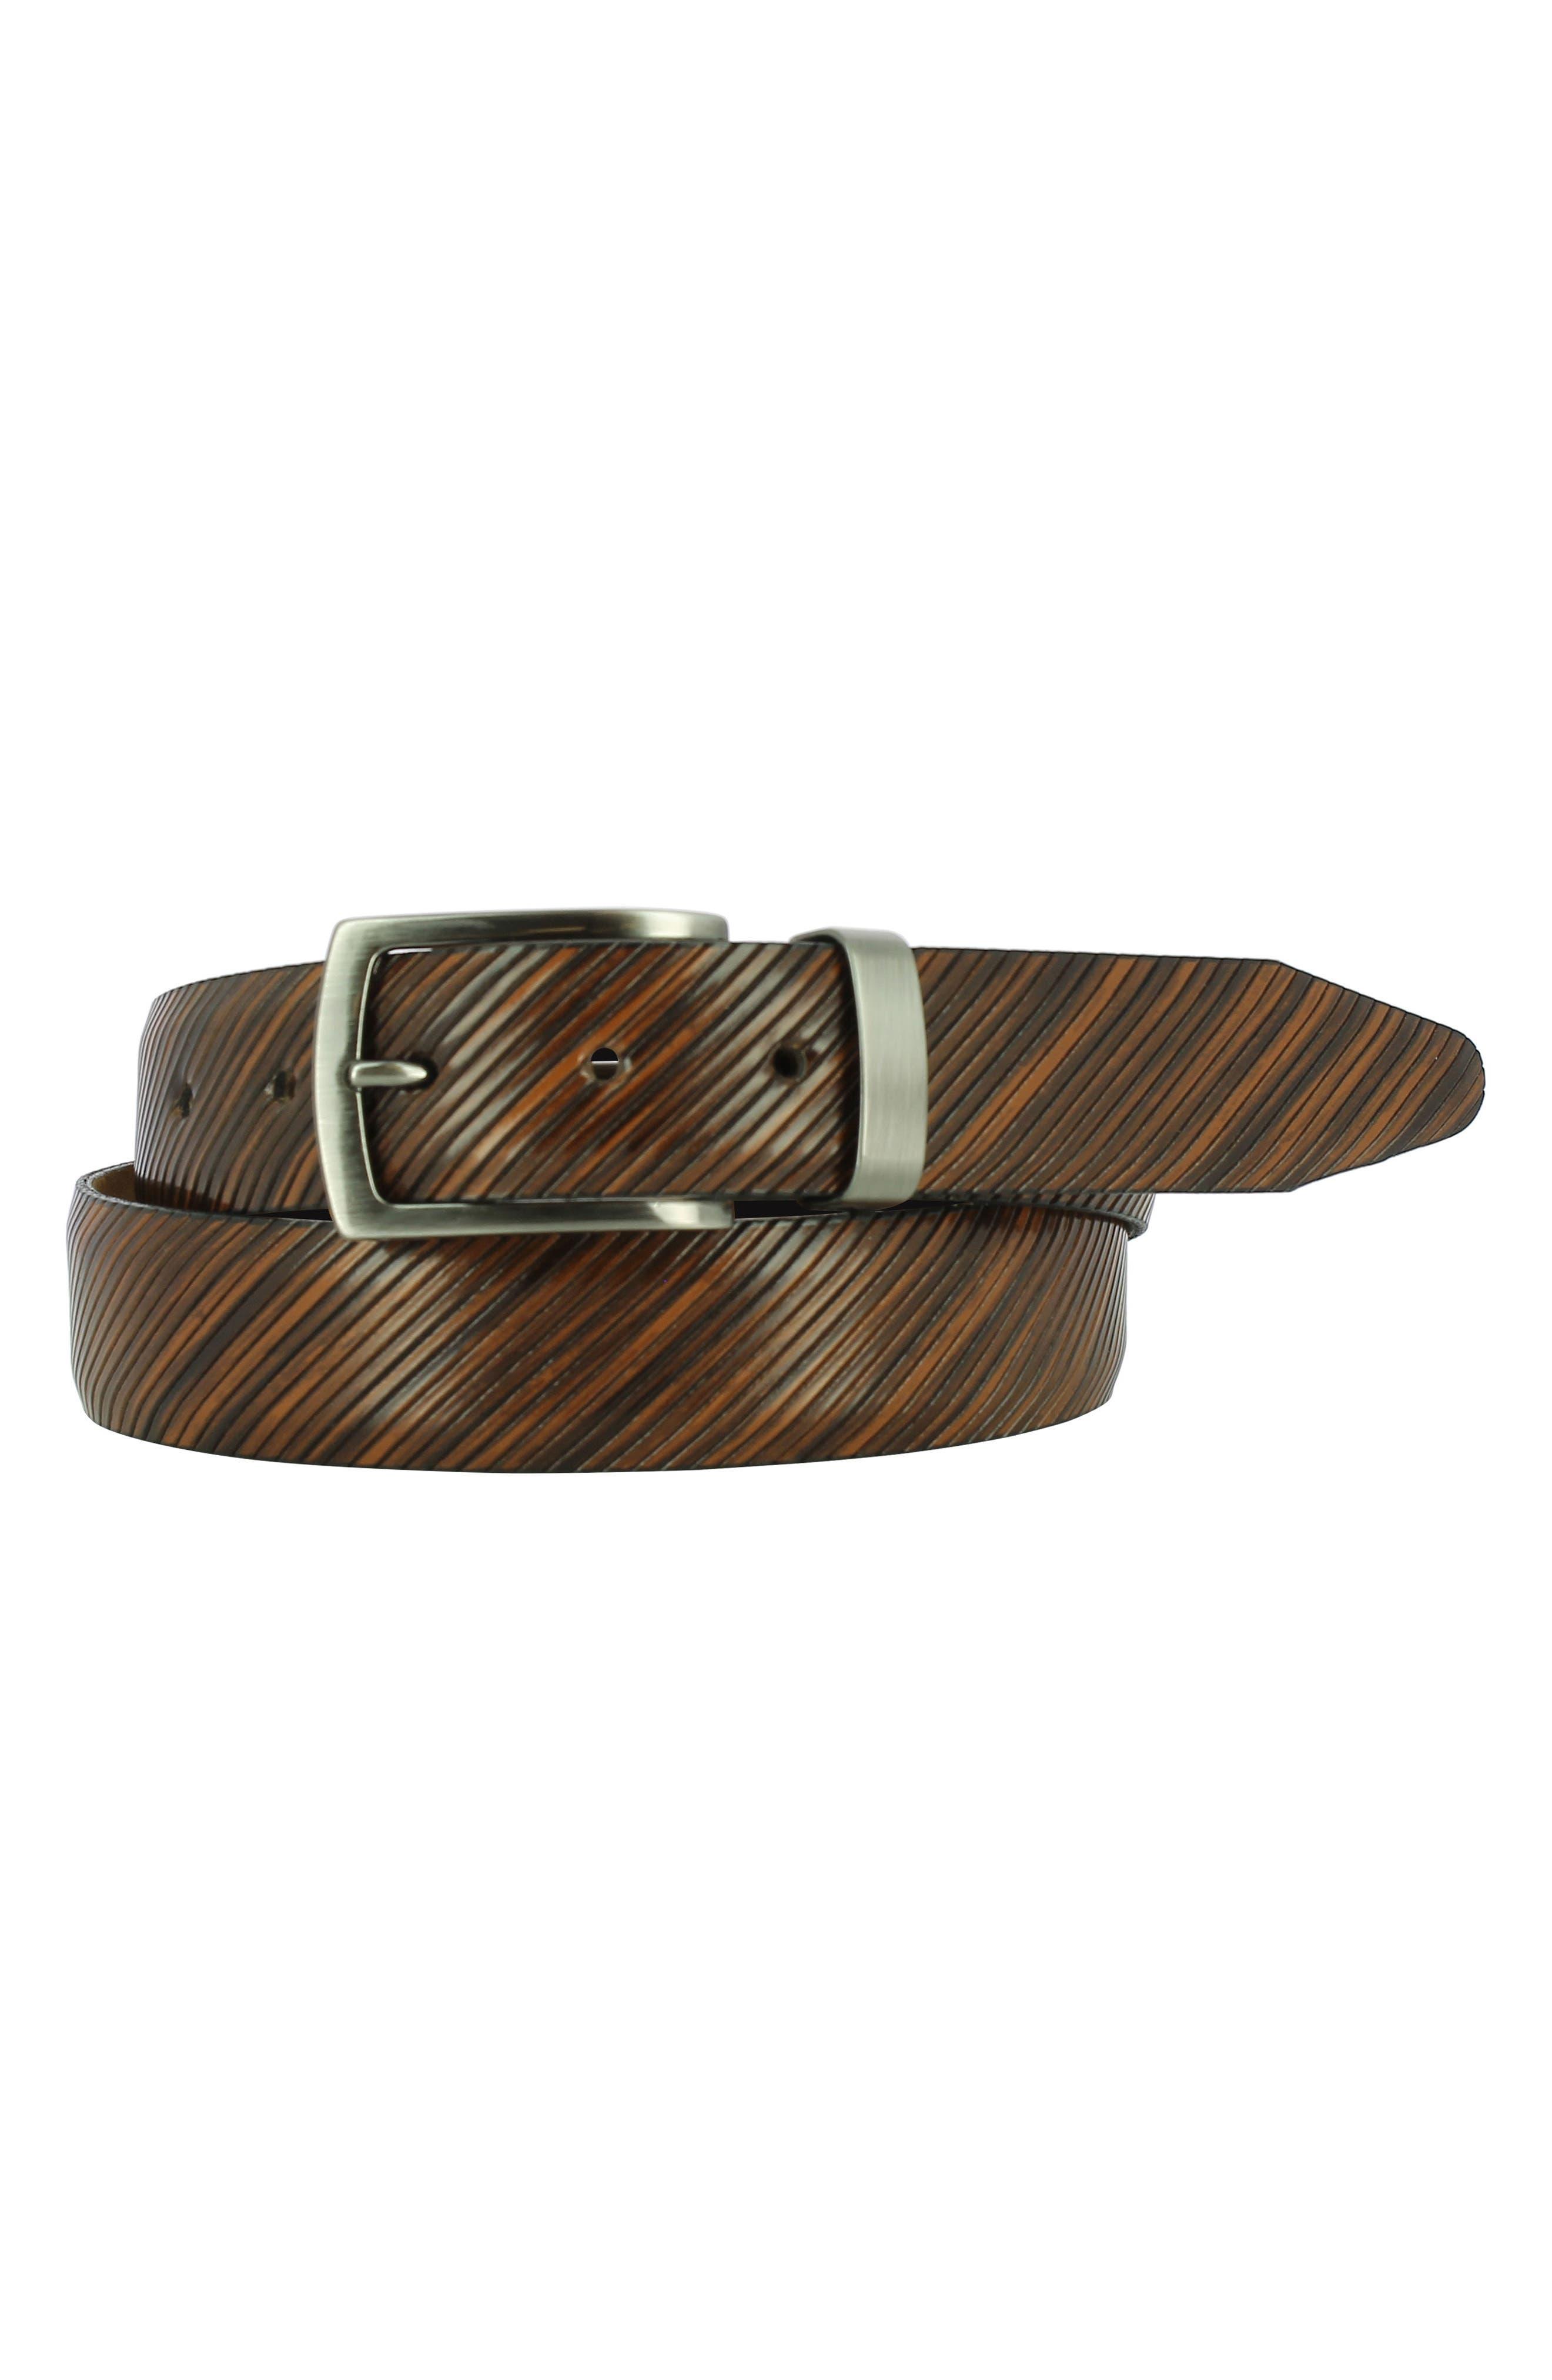 Remo Tulliani Sylvio Leather Belt, Tan